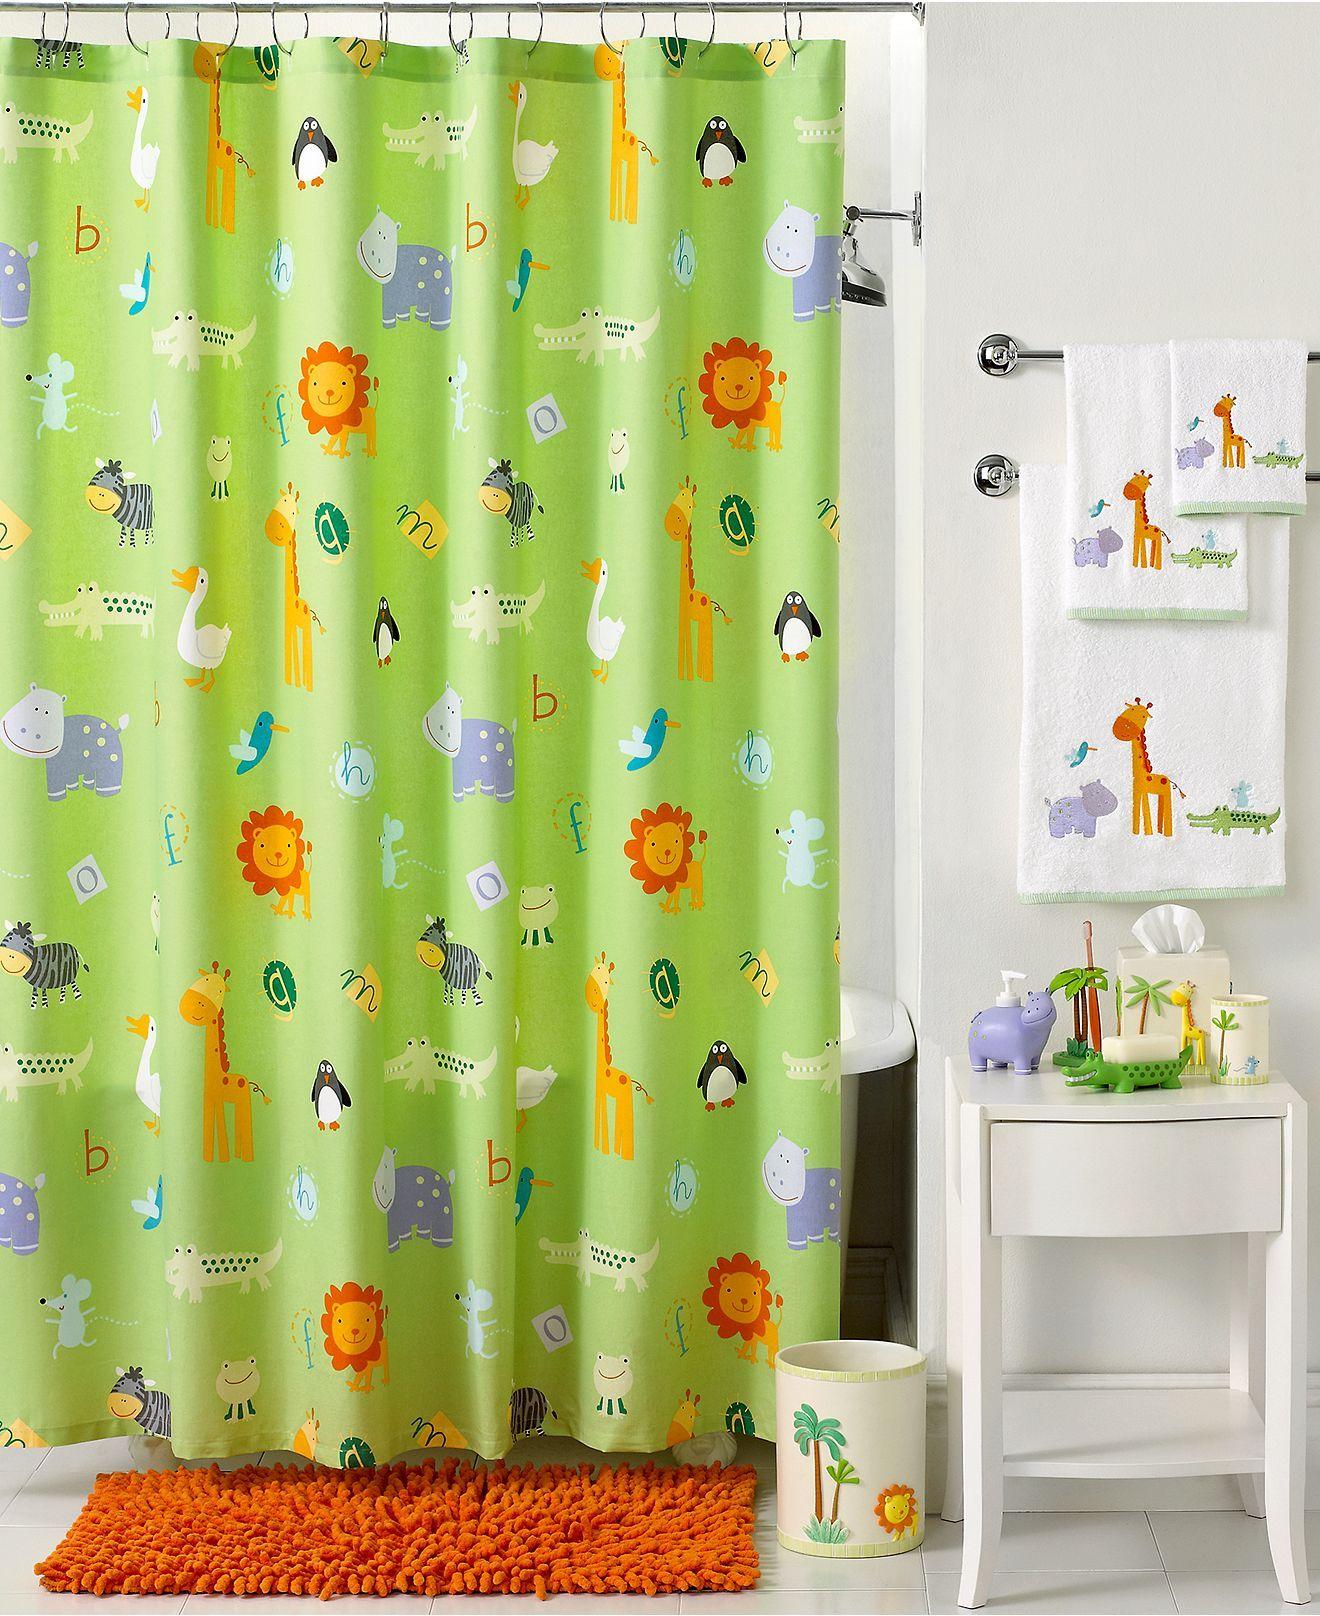 Kassatex Bath Accessories Zoo Friends Shower Curtain Shower Curtains Accessories Bed Bath Mac Bathroom Kids Kids Bath Bathroom Collections